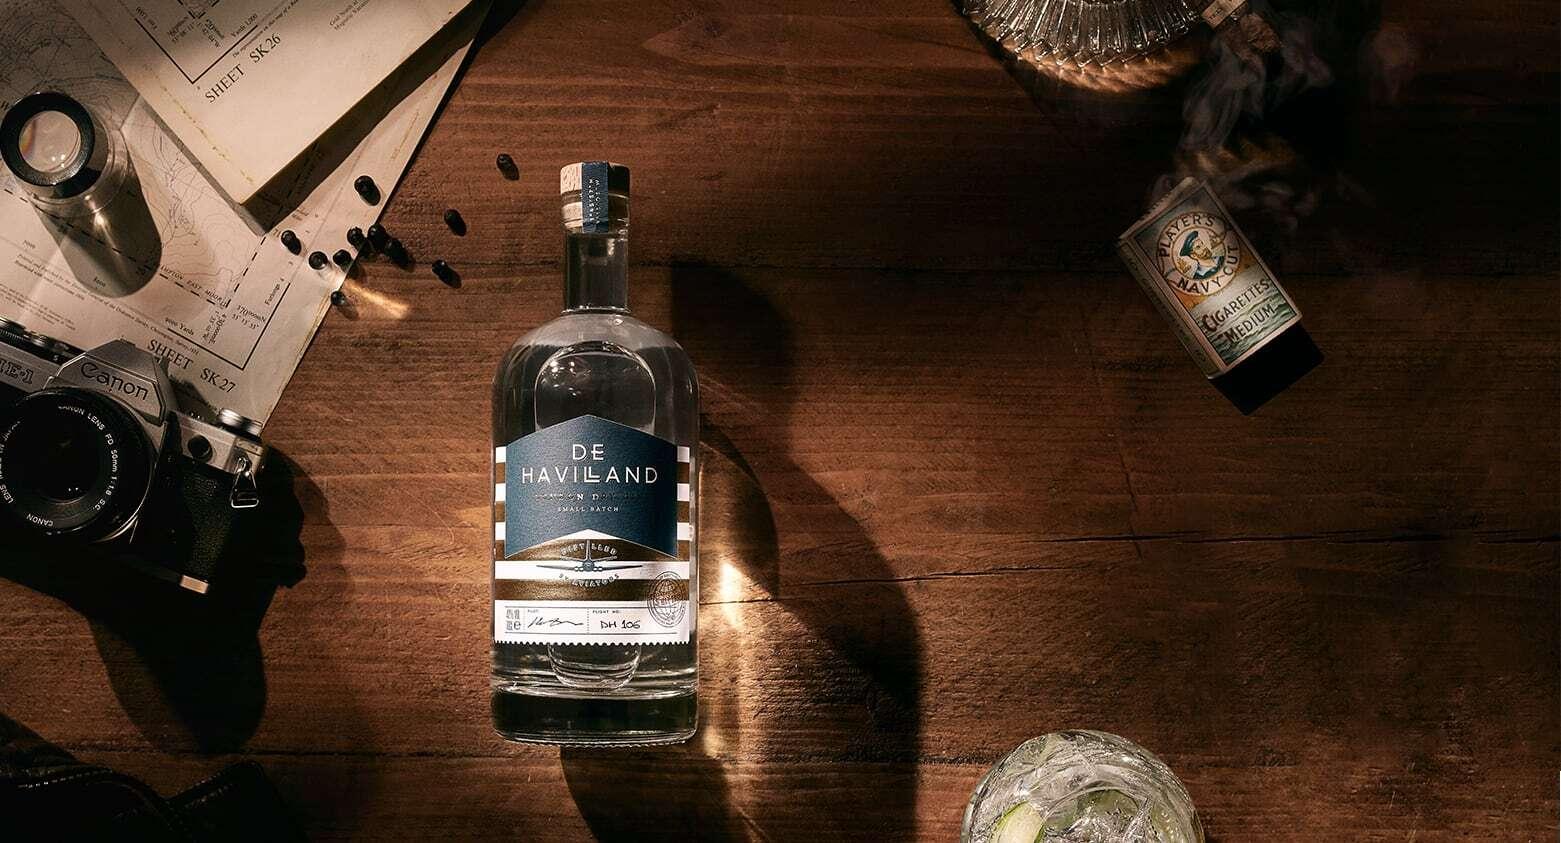 De Havilland Gin - London Dry Gin - Distilled by Aviators